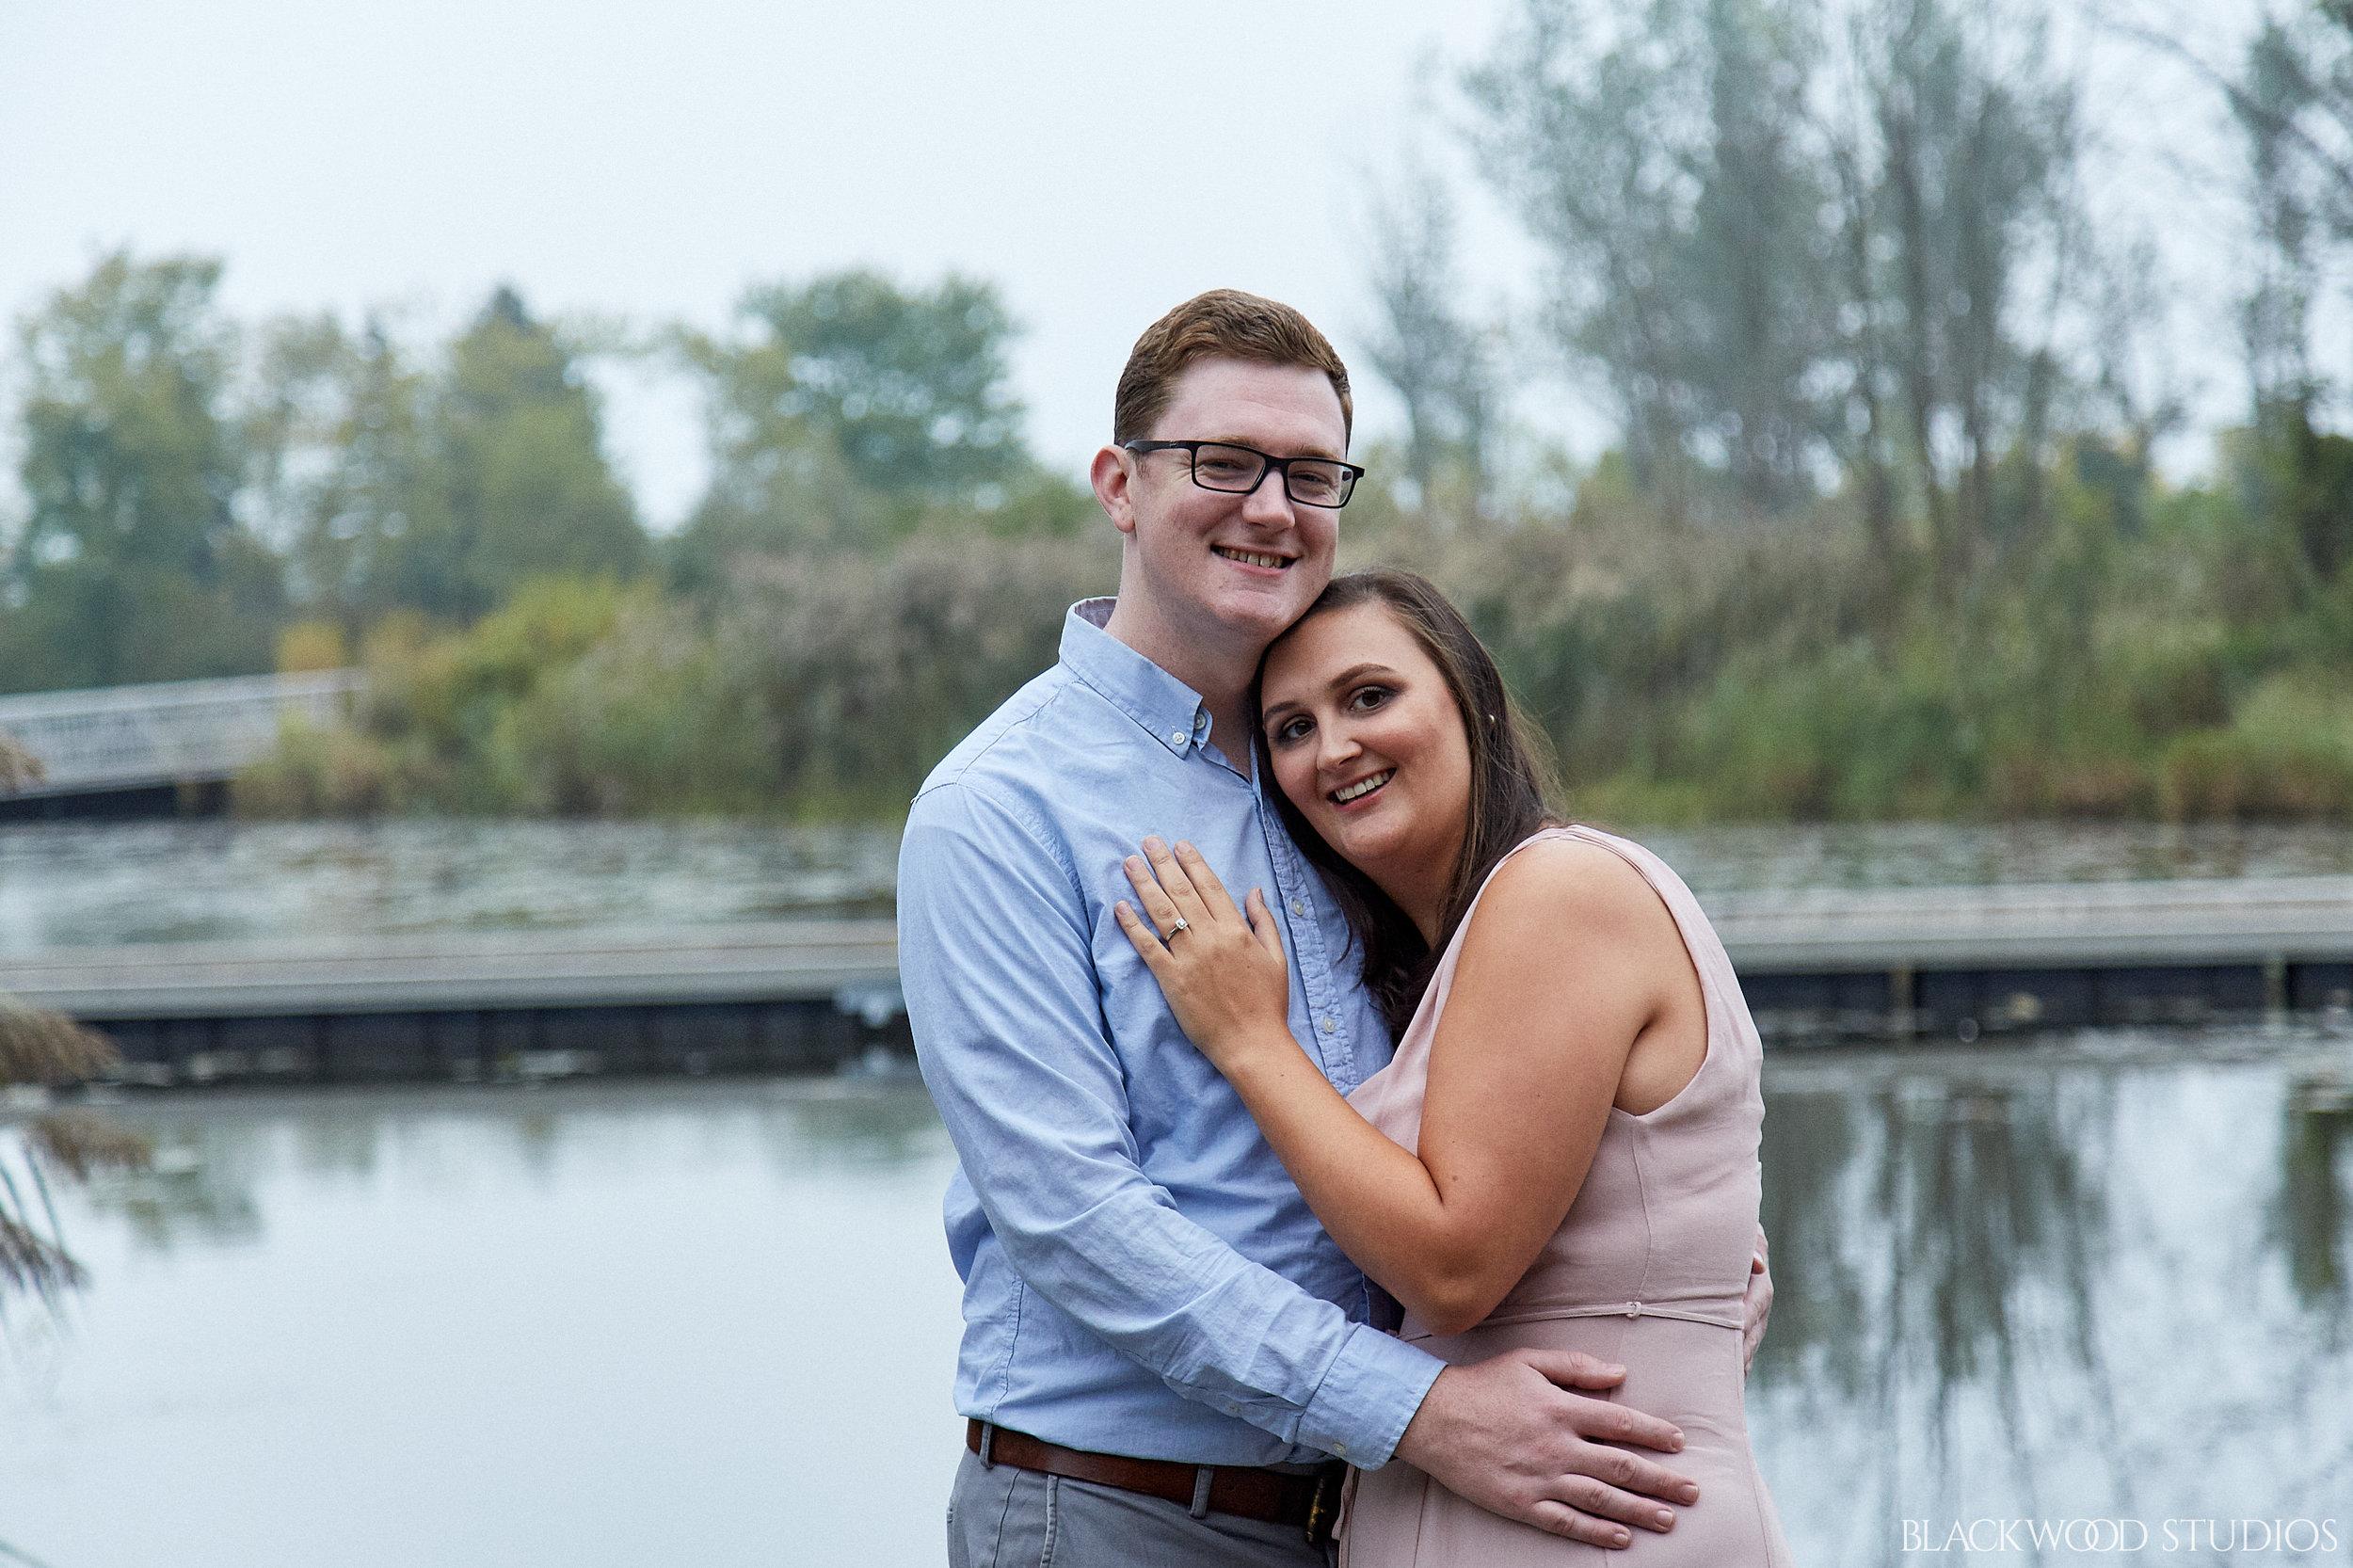 Blackwood-Studios-20181008-17-24-41-Justin-and-Samantha-Engagement-Photography-foggy-Scaraborough-Bluffs-Park-Ontario.jpg